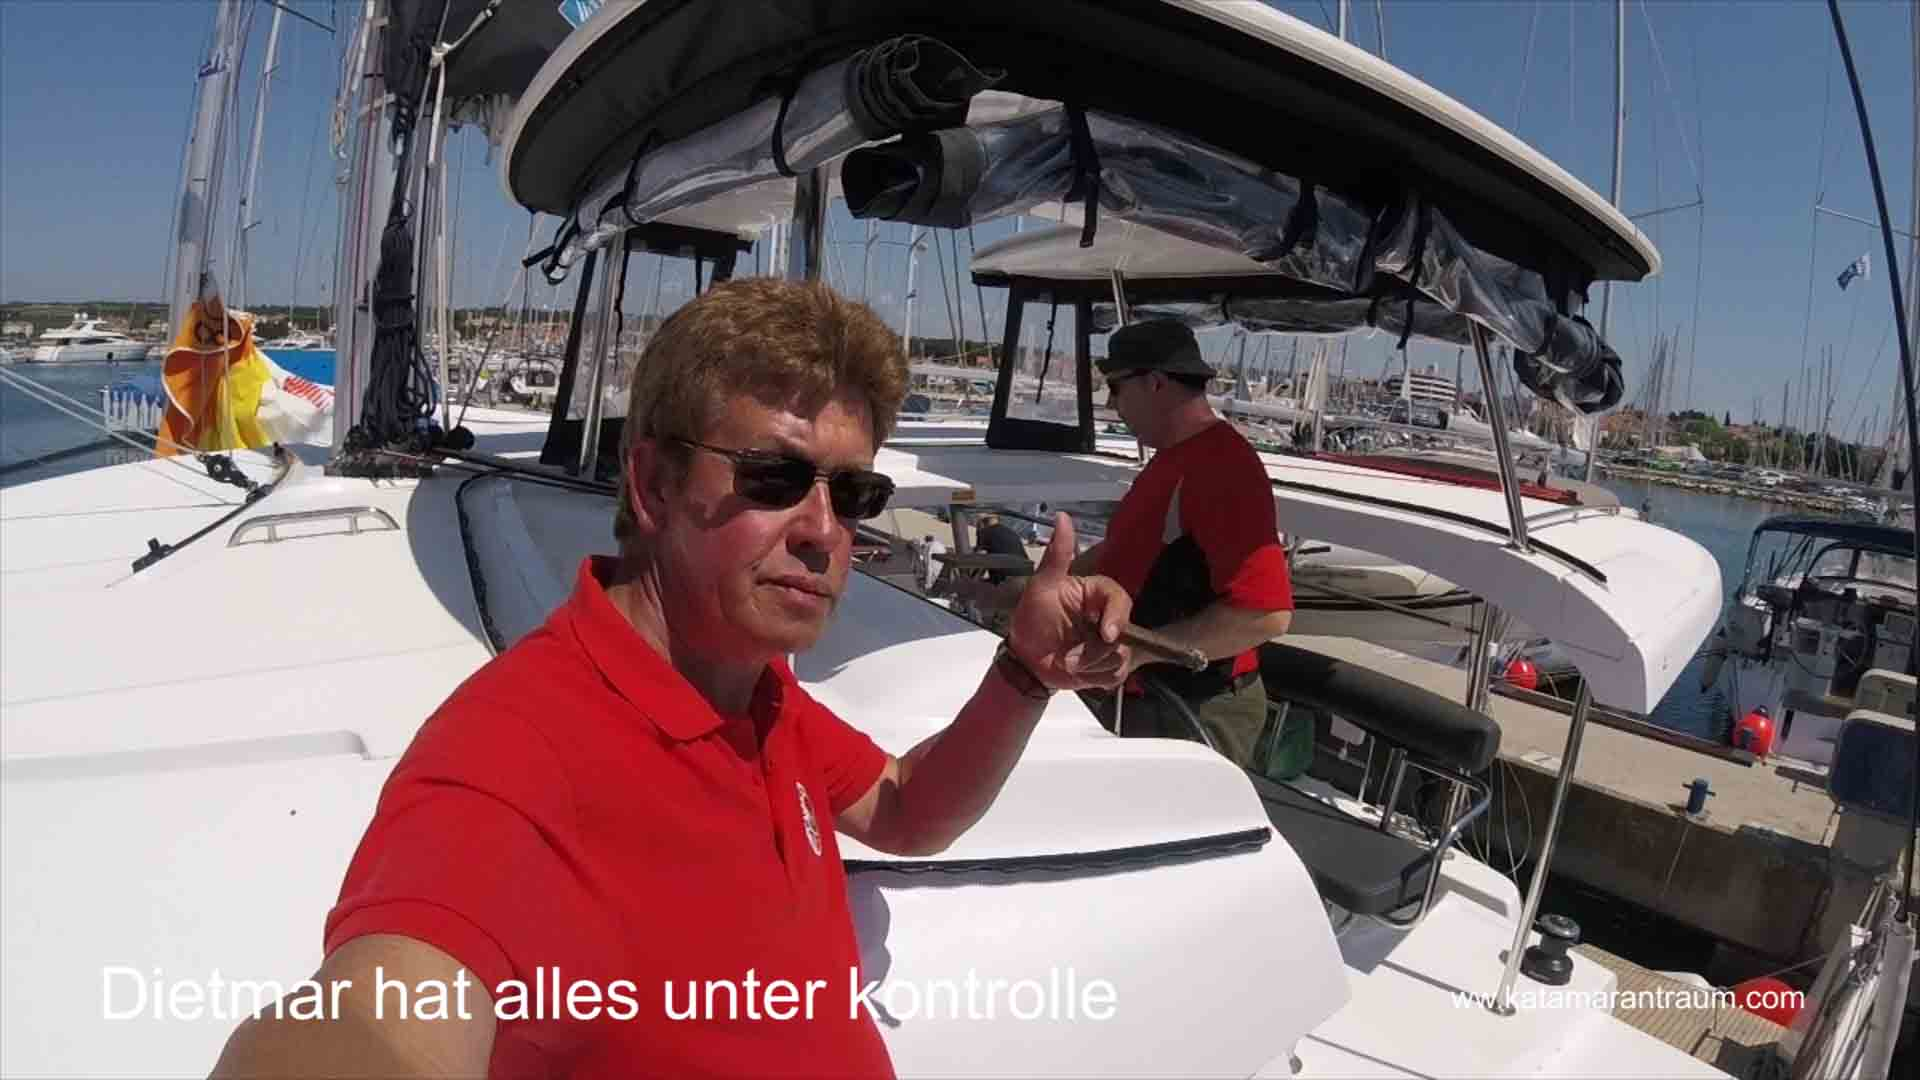 At the Catamaran Skipper Training Dietmar has the overview